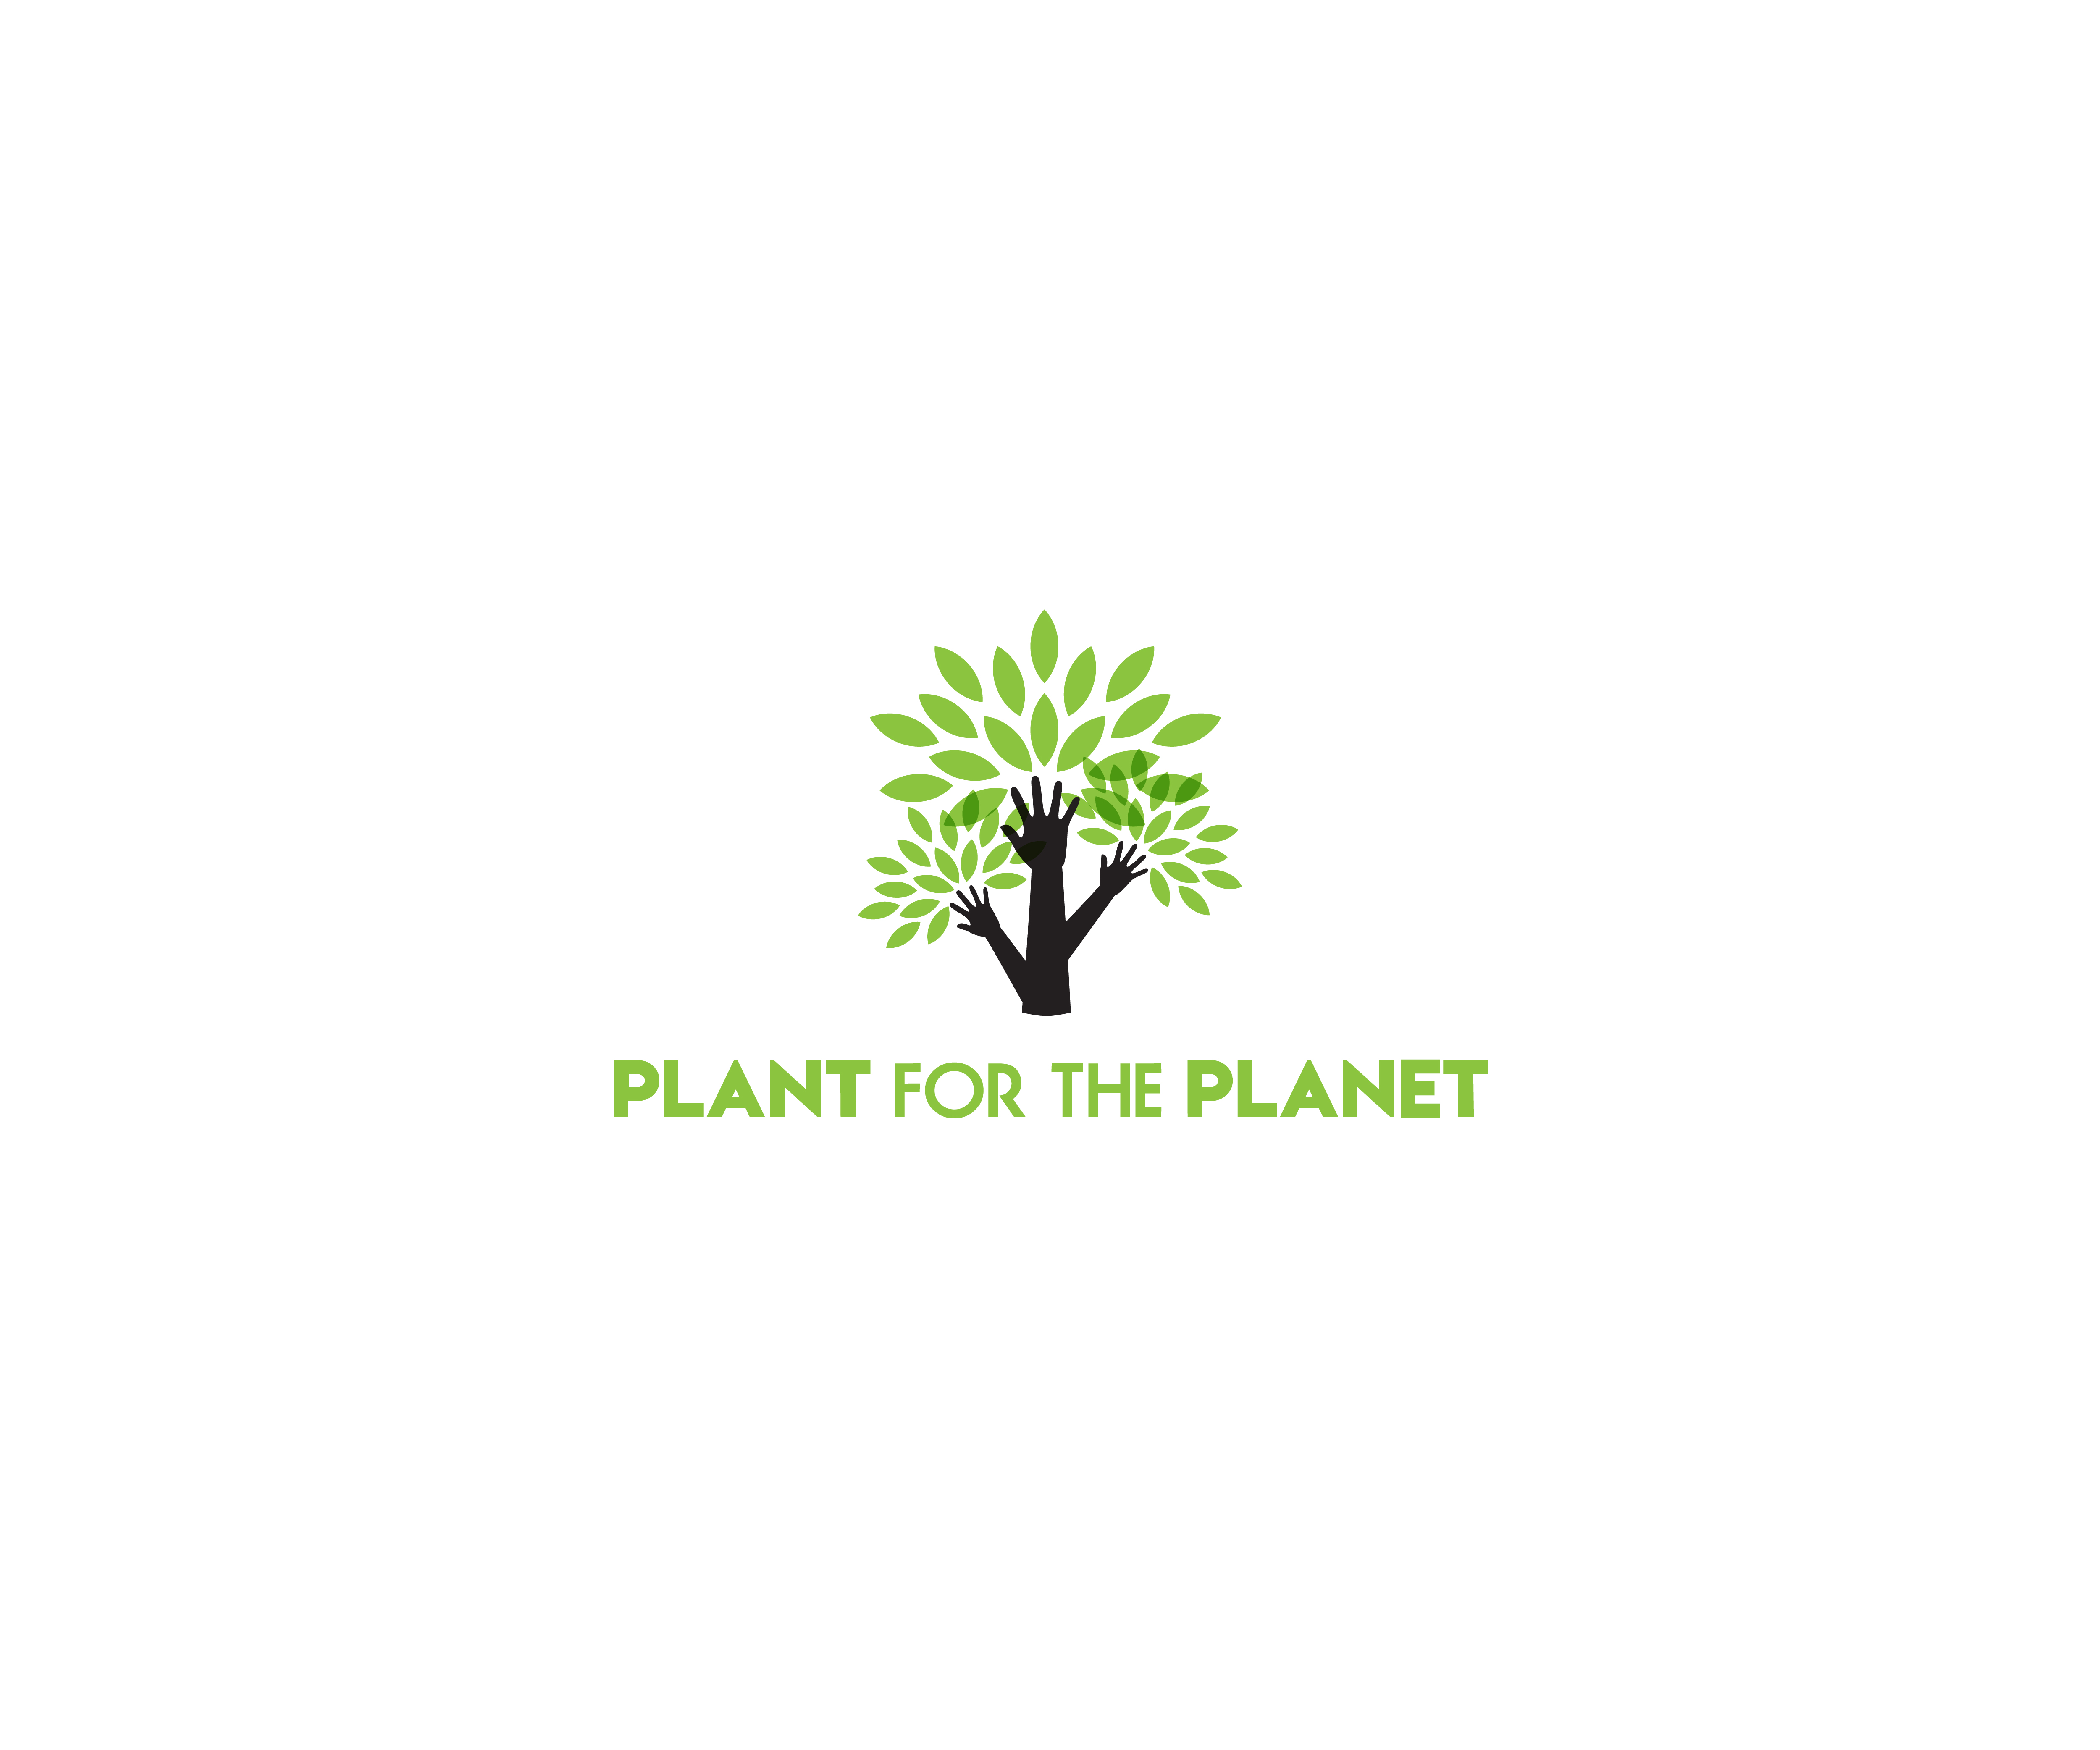 design creative and professional logo